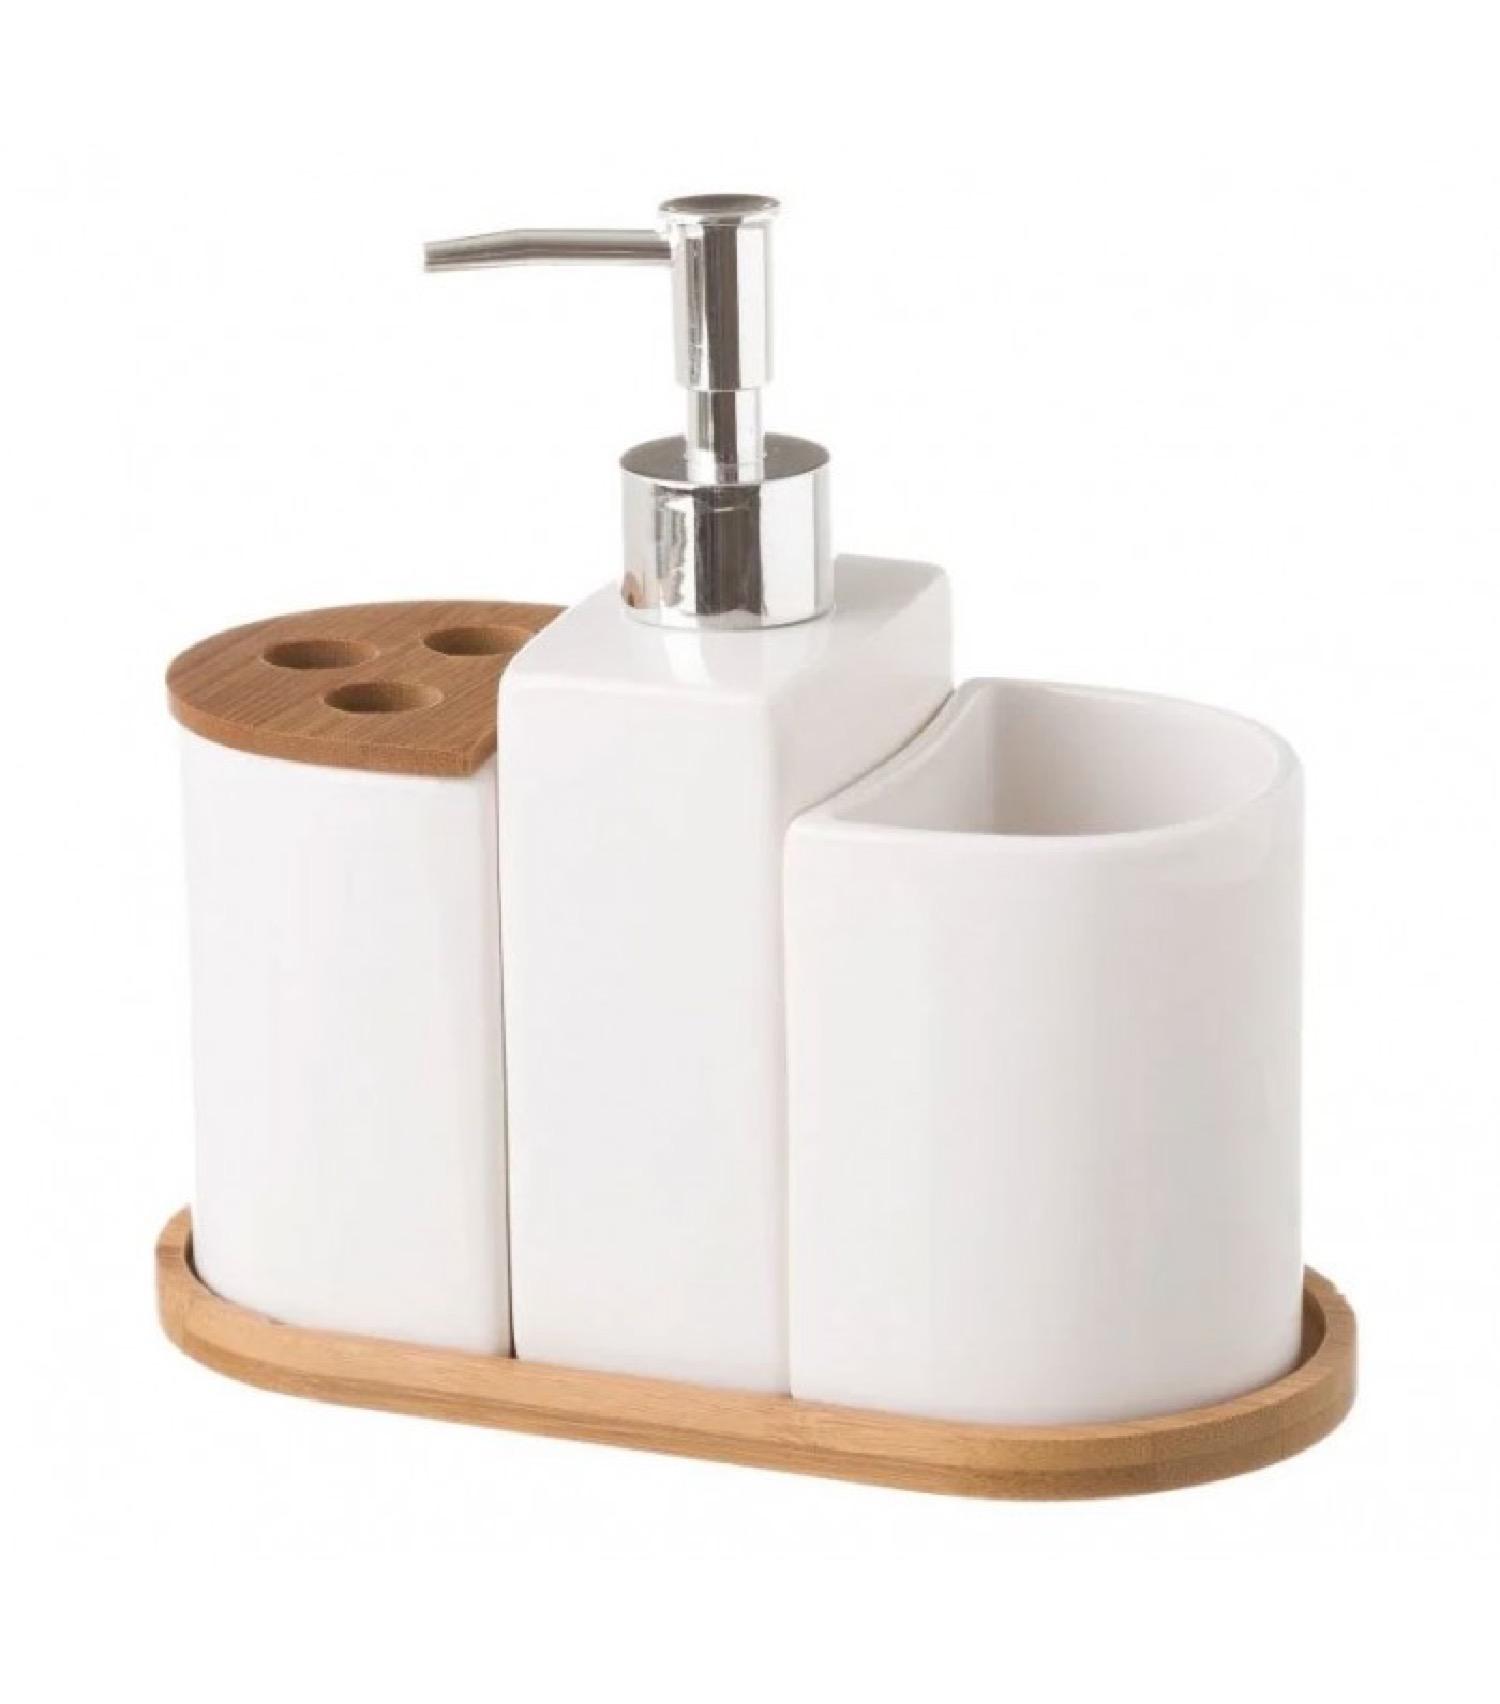 Set de salle de bain céramique et bambou